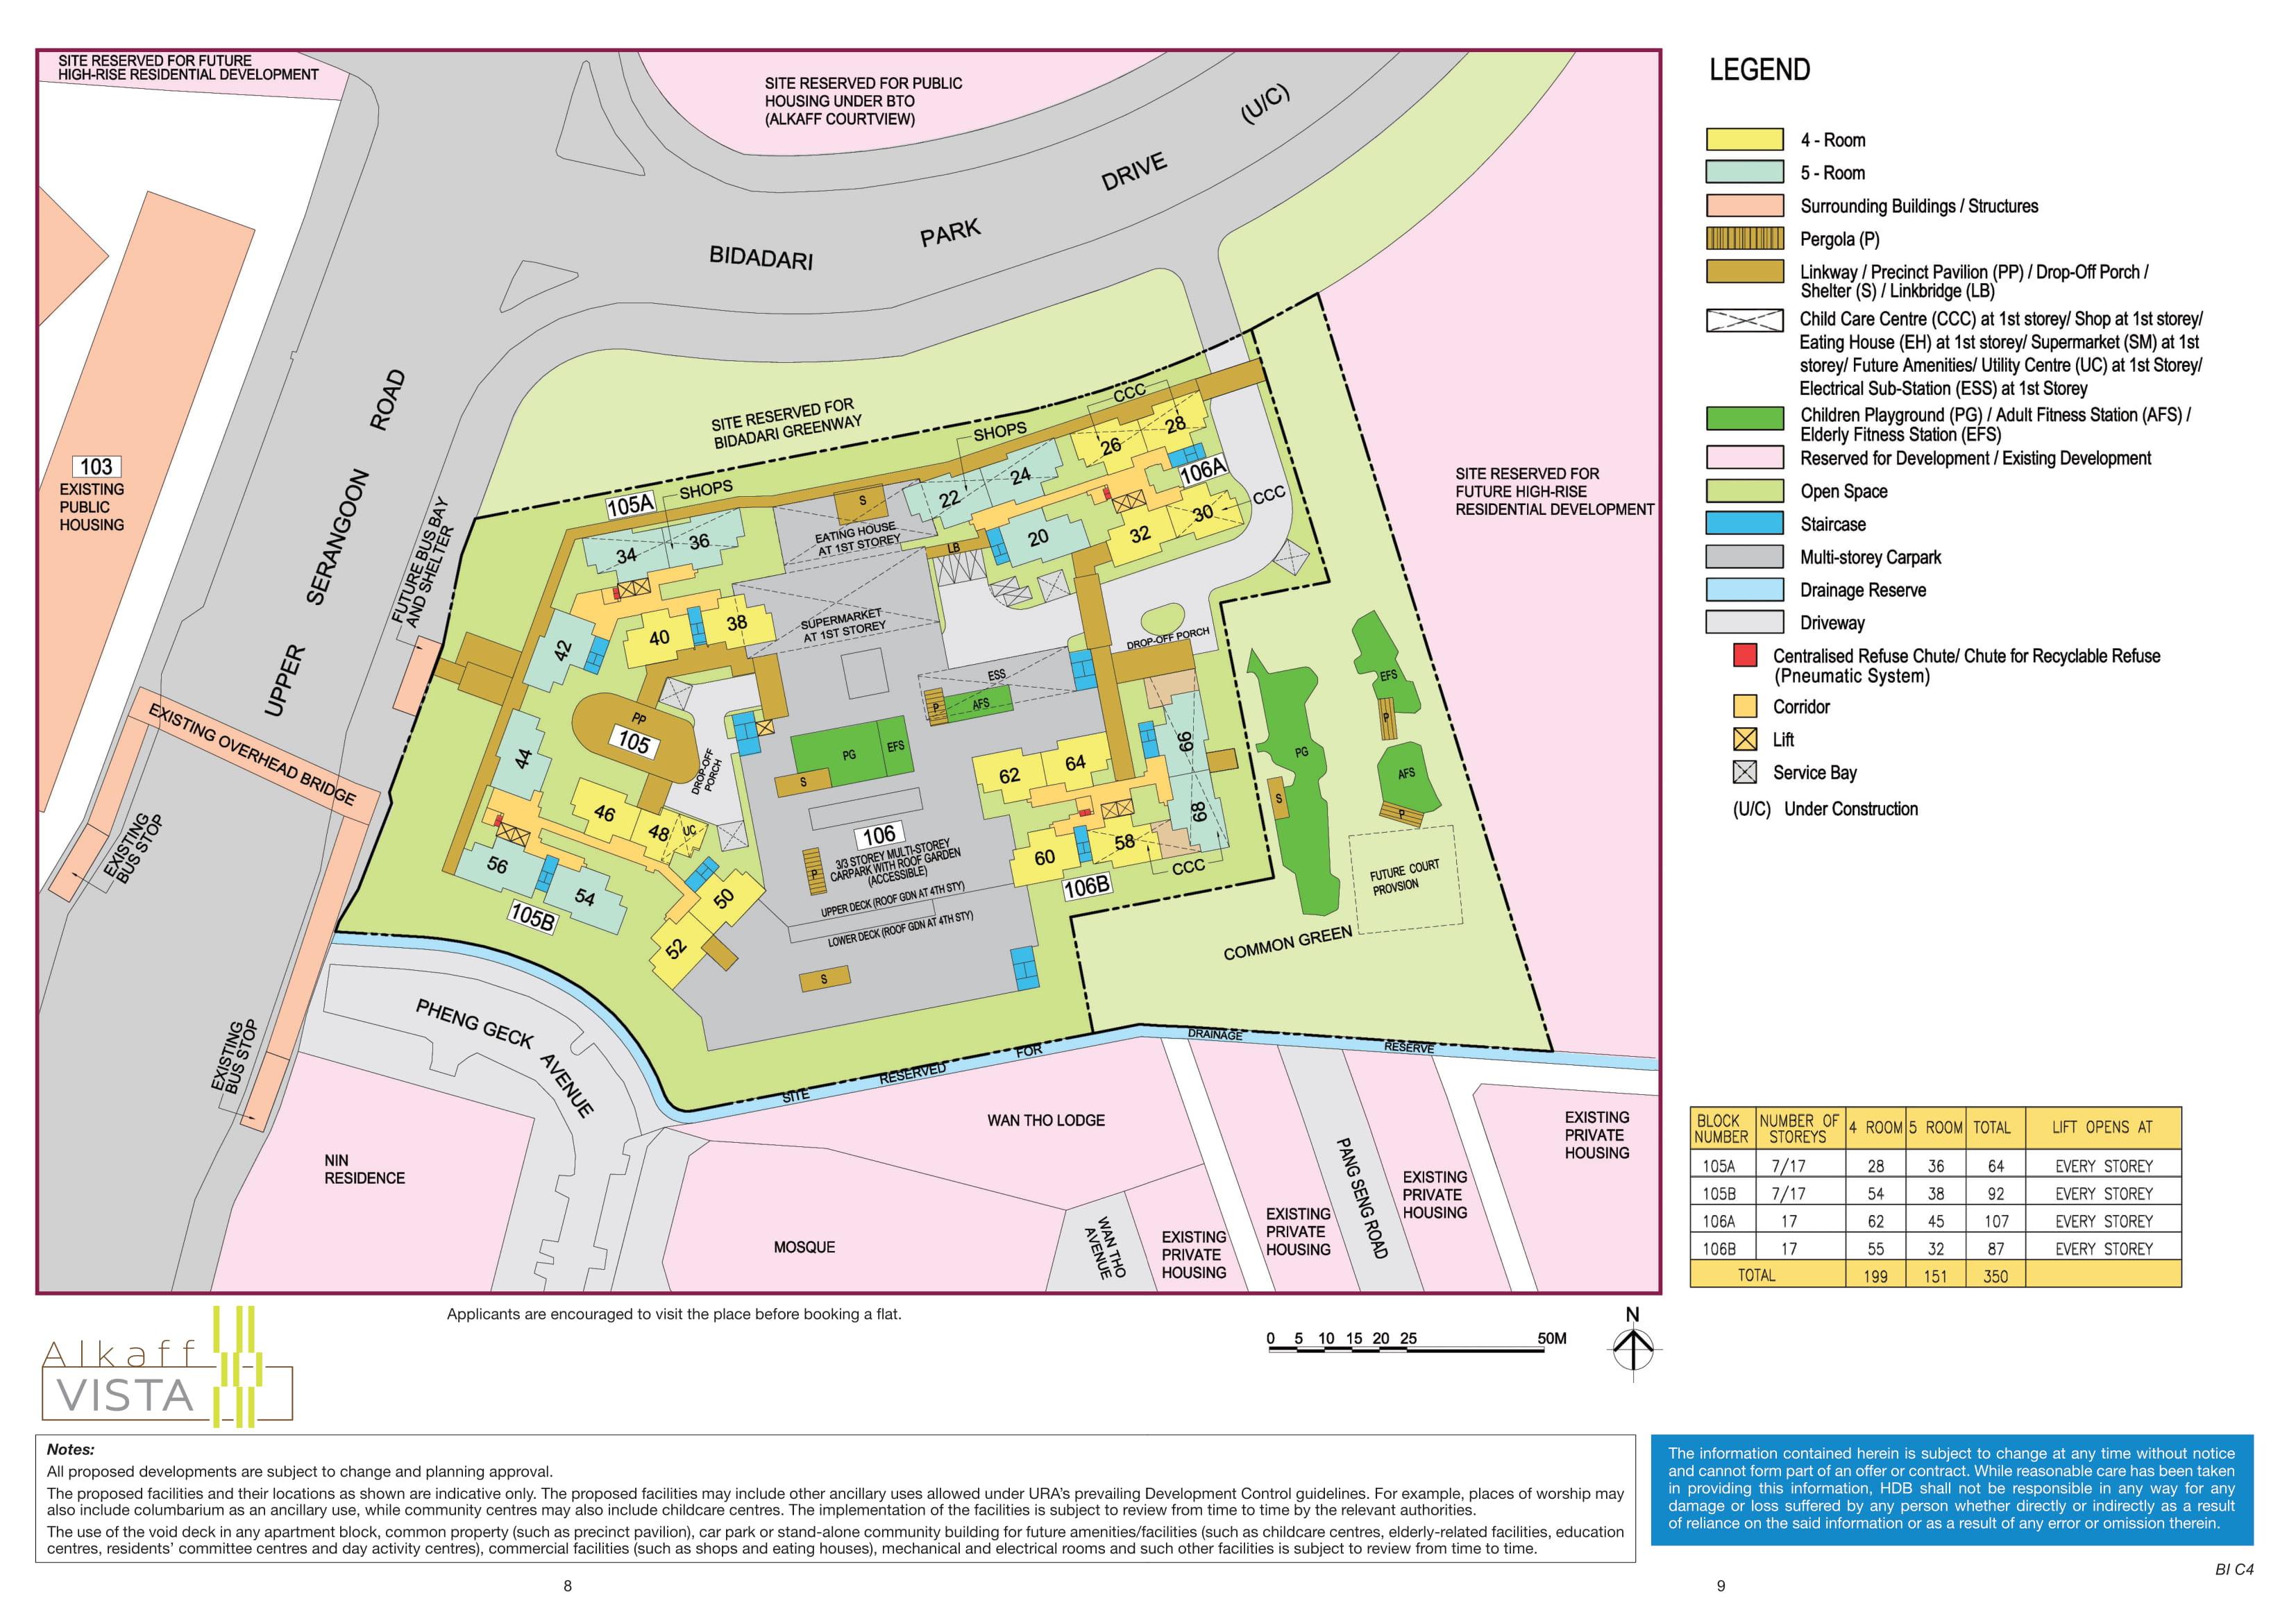 Bidadari Alkaff Vista Site Plan